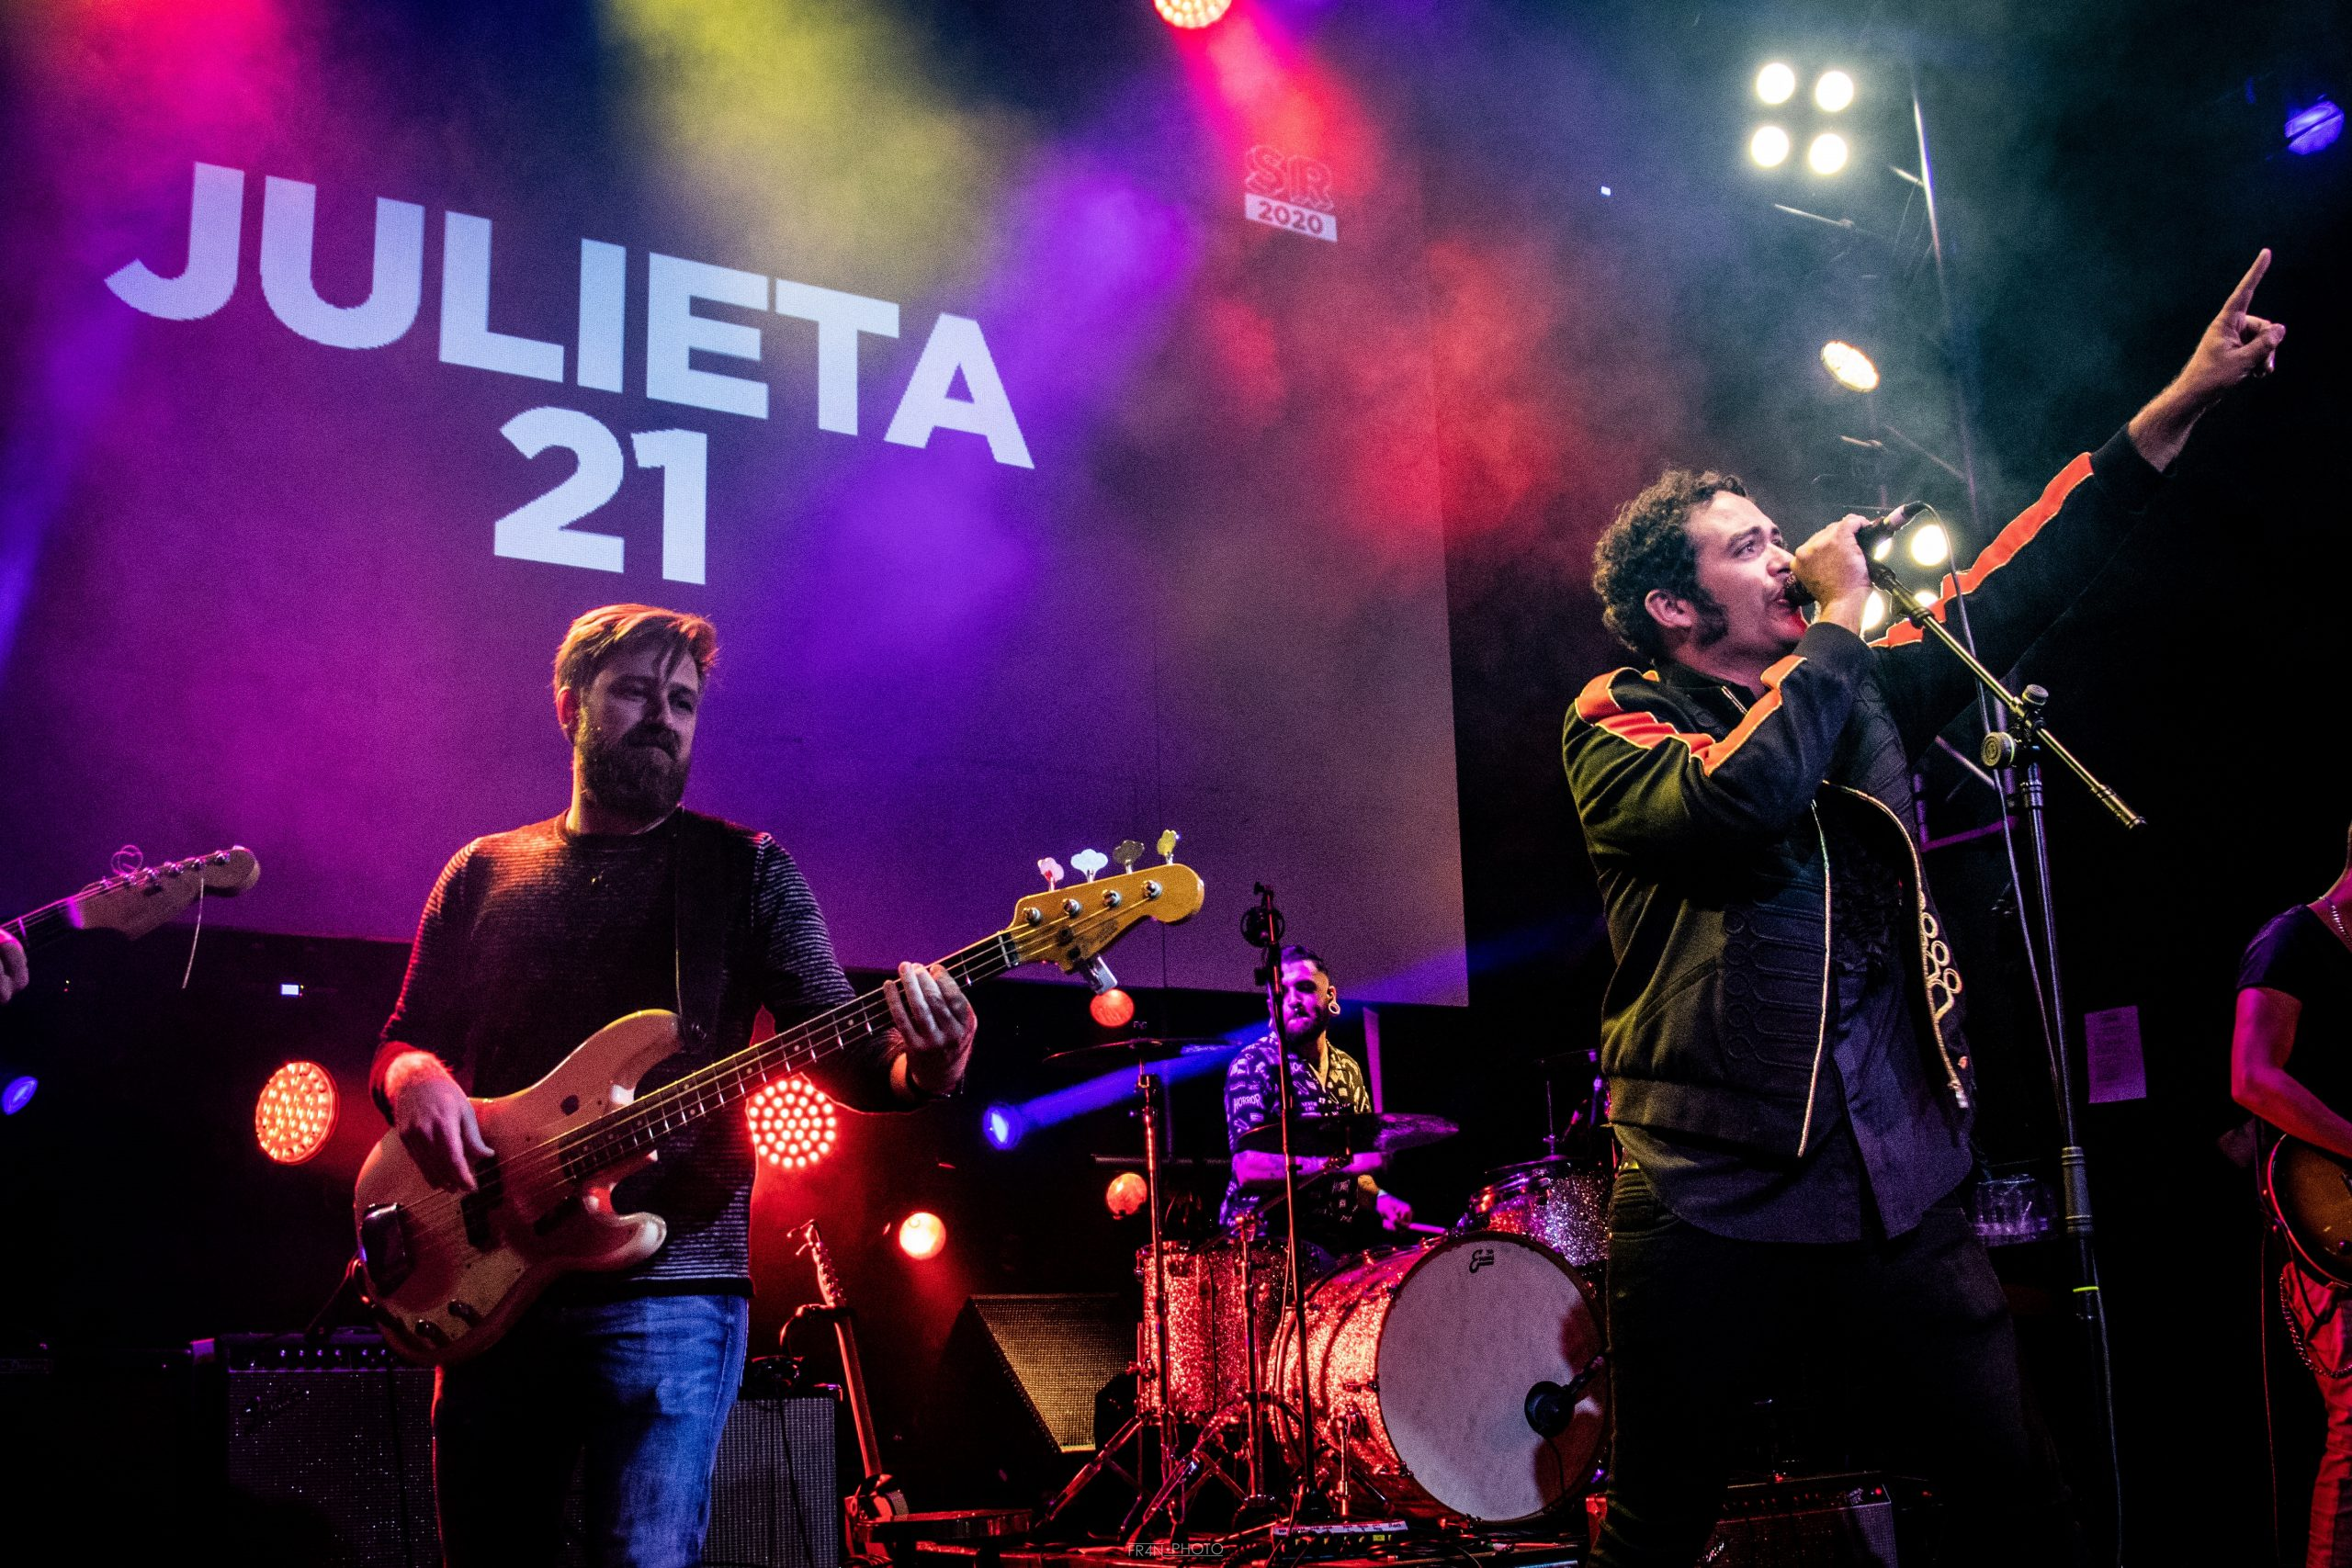 Julieta 21